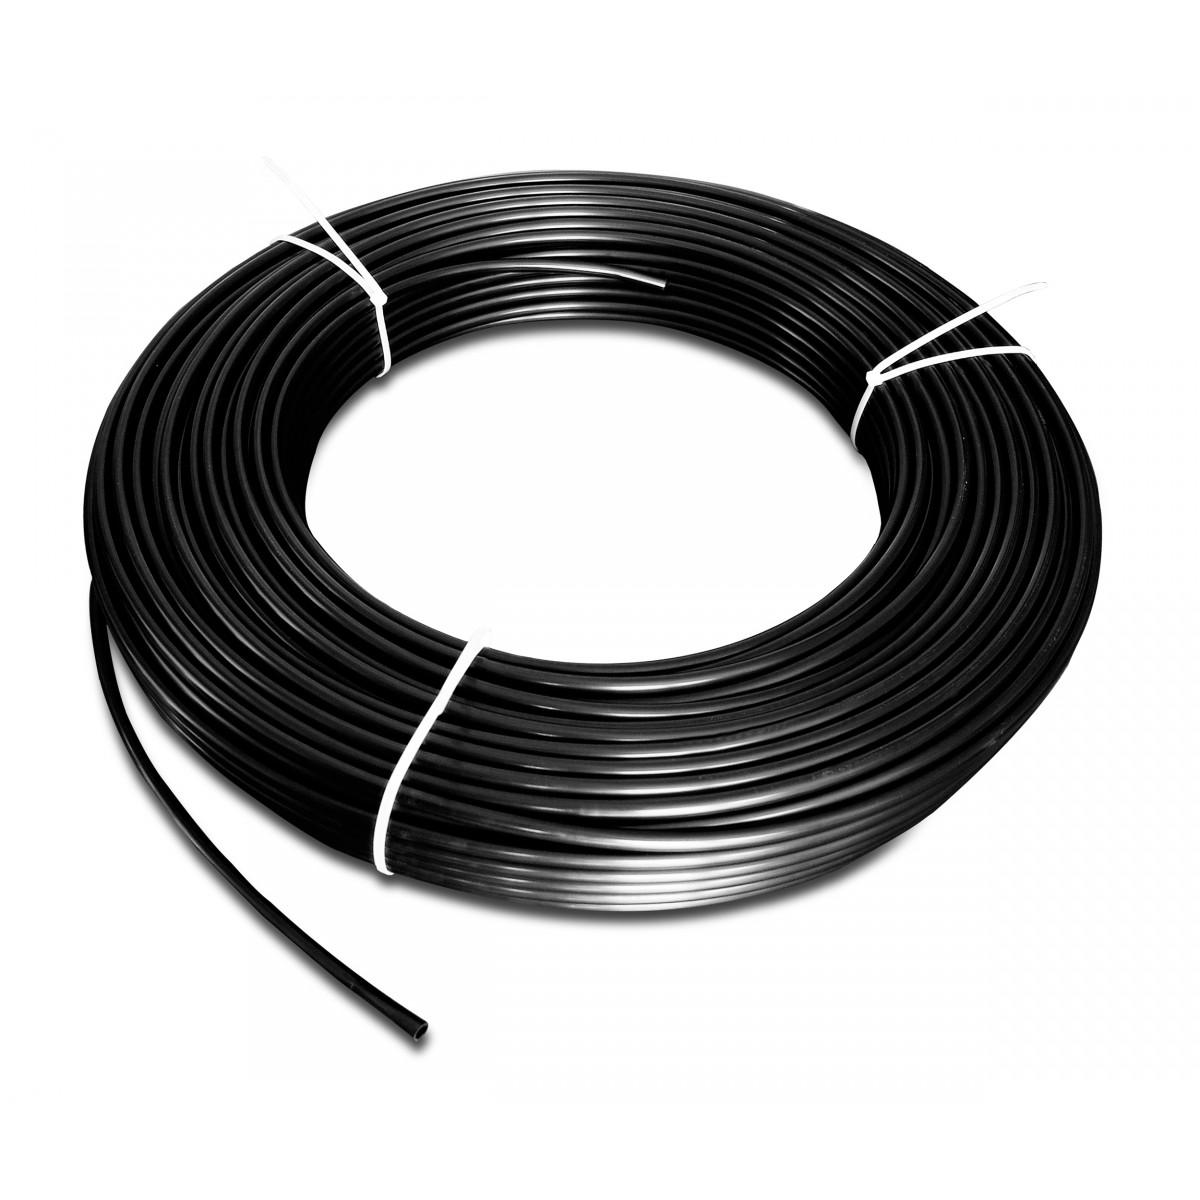 99670c767ebfdd Przewód wąż poliamid PA Tekalan 6/4 mm 1mb czarny WASHSERVICE